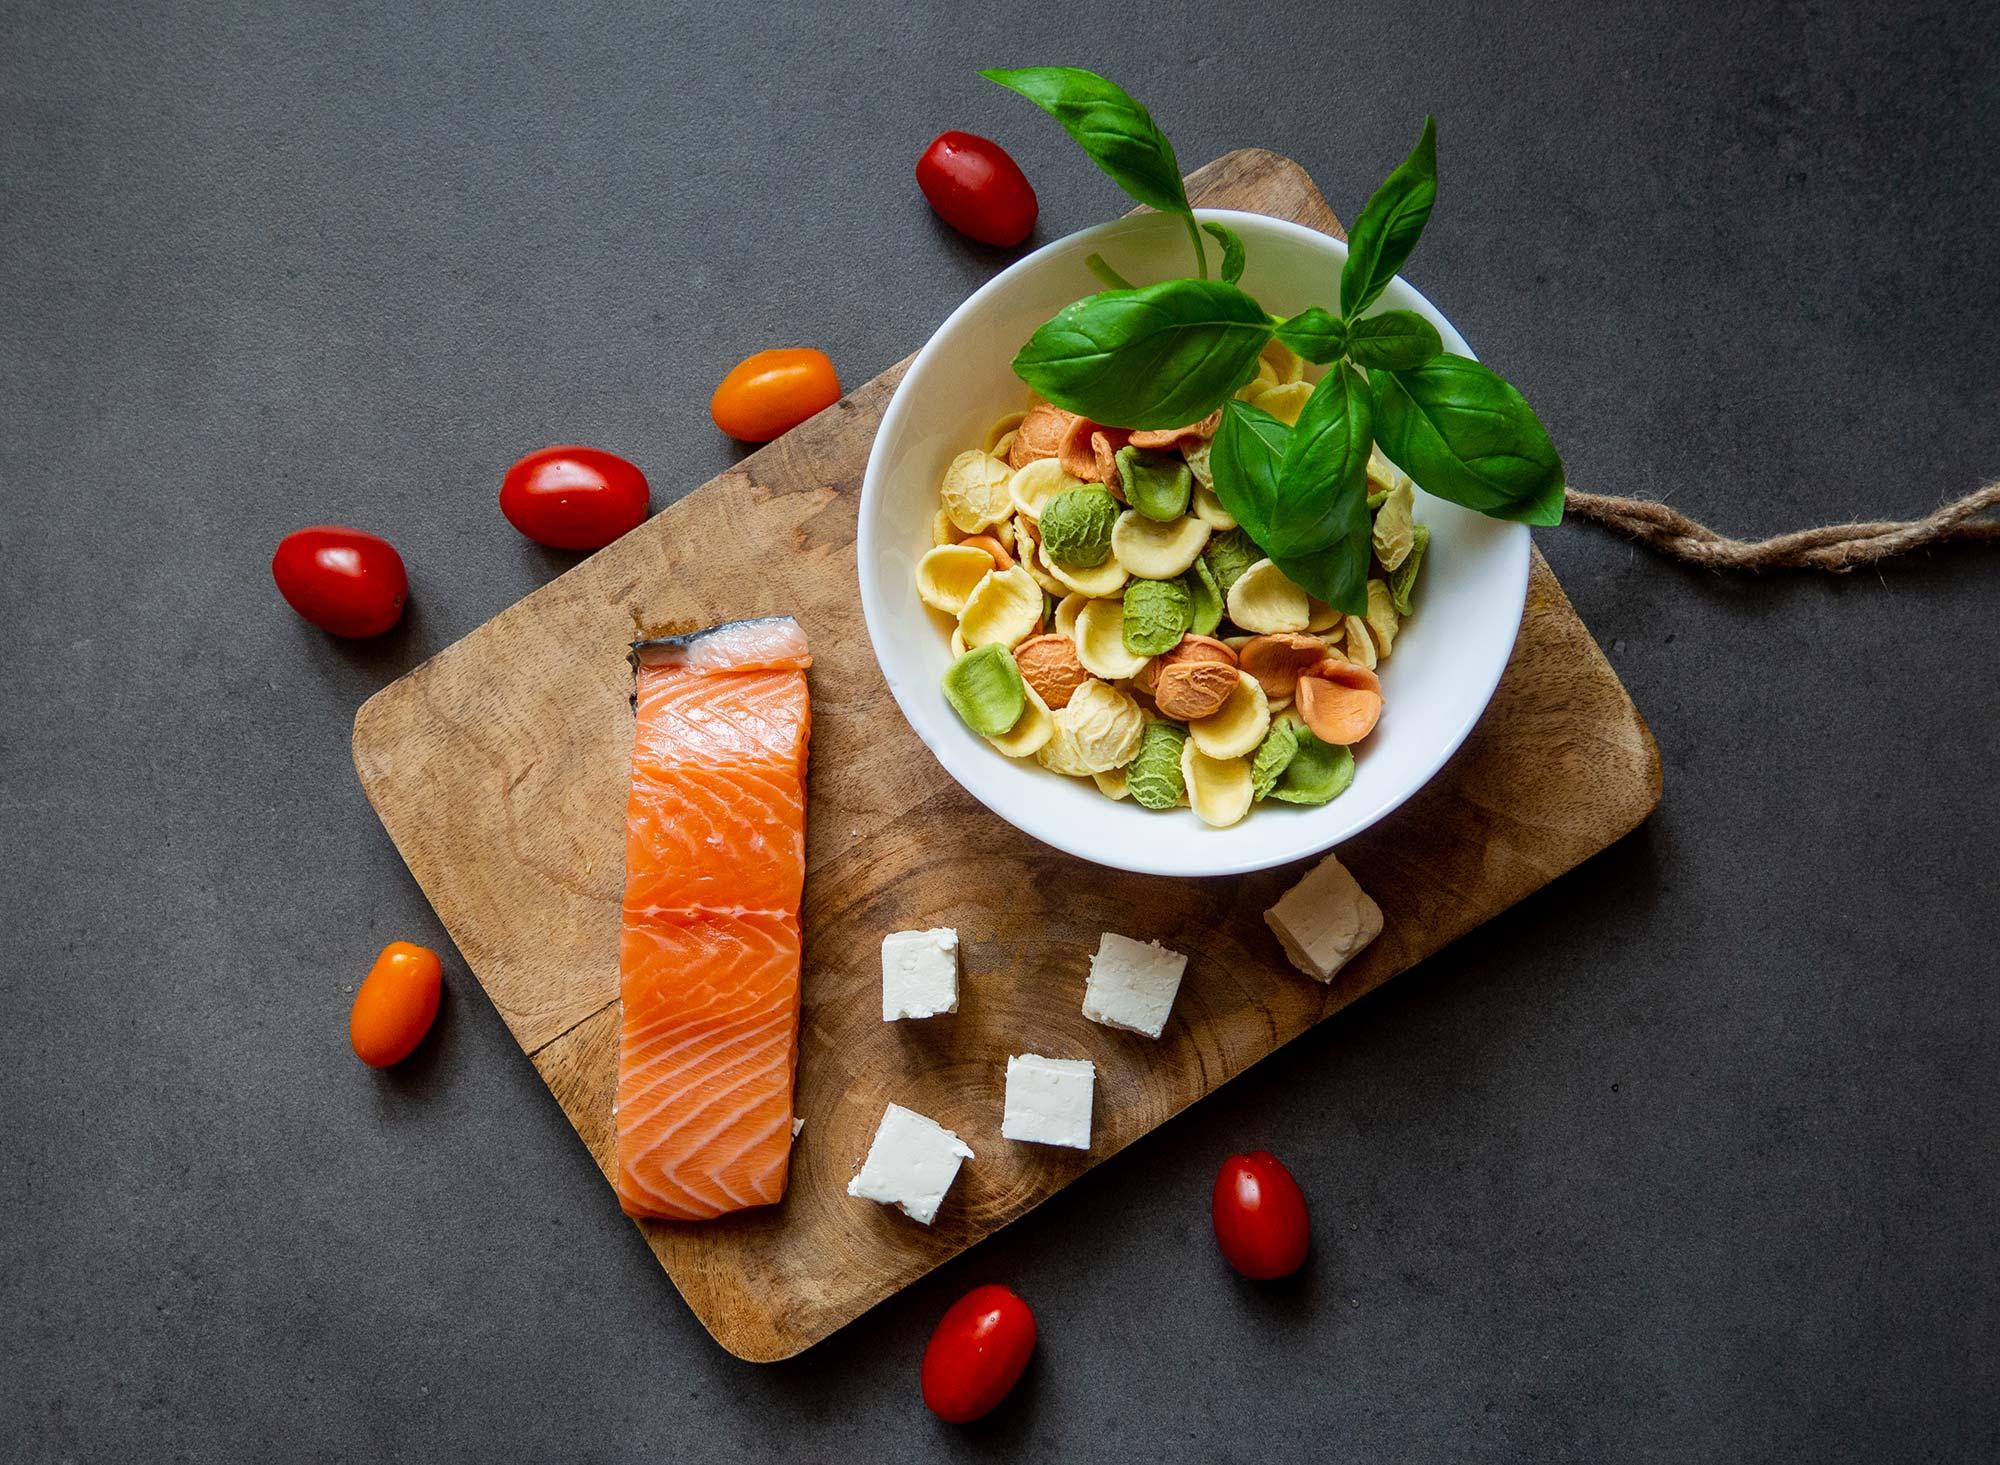 Pesto with basil pesto ingredients